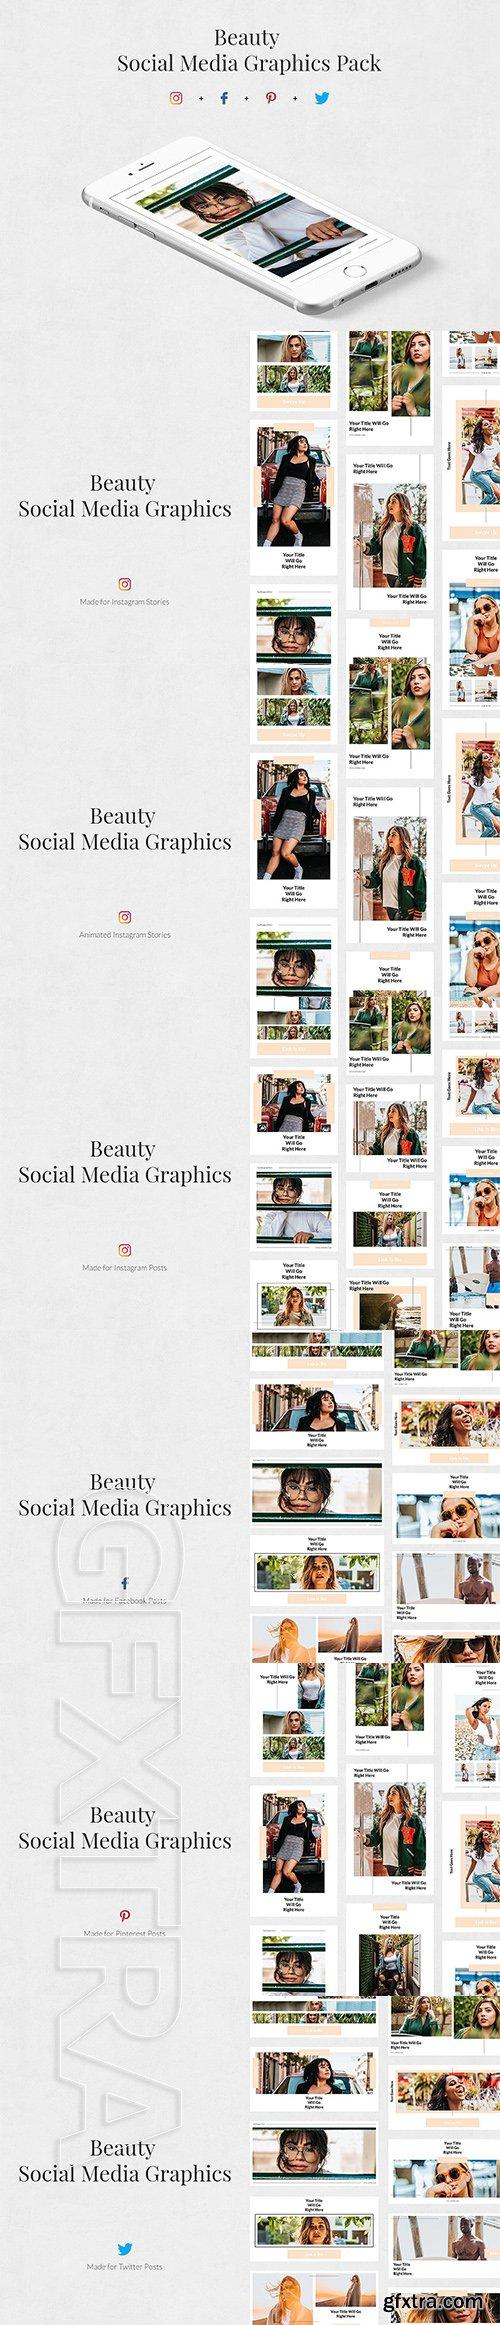 CreativeMarket - Beauty Pack 3170601